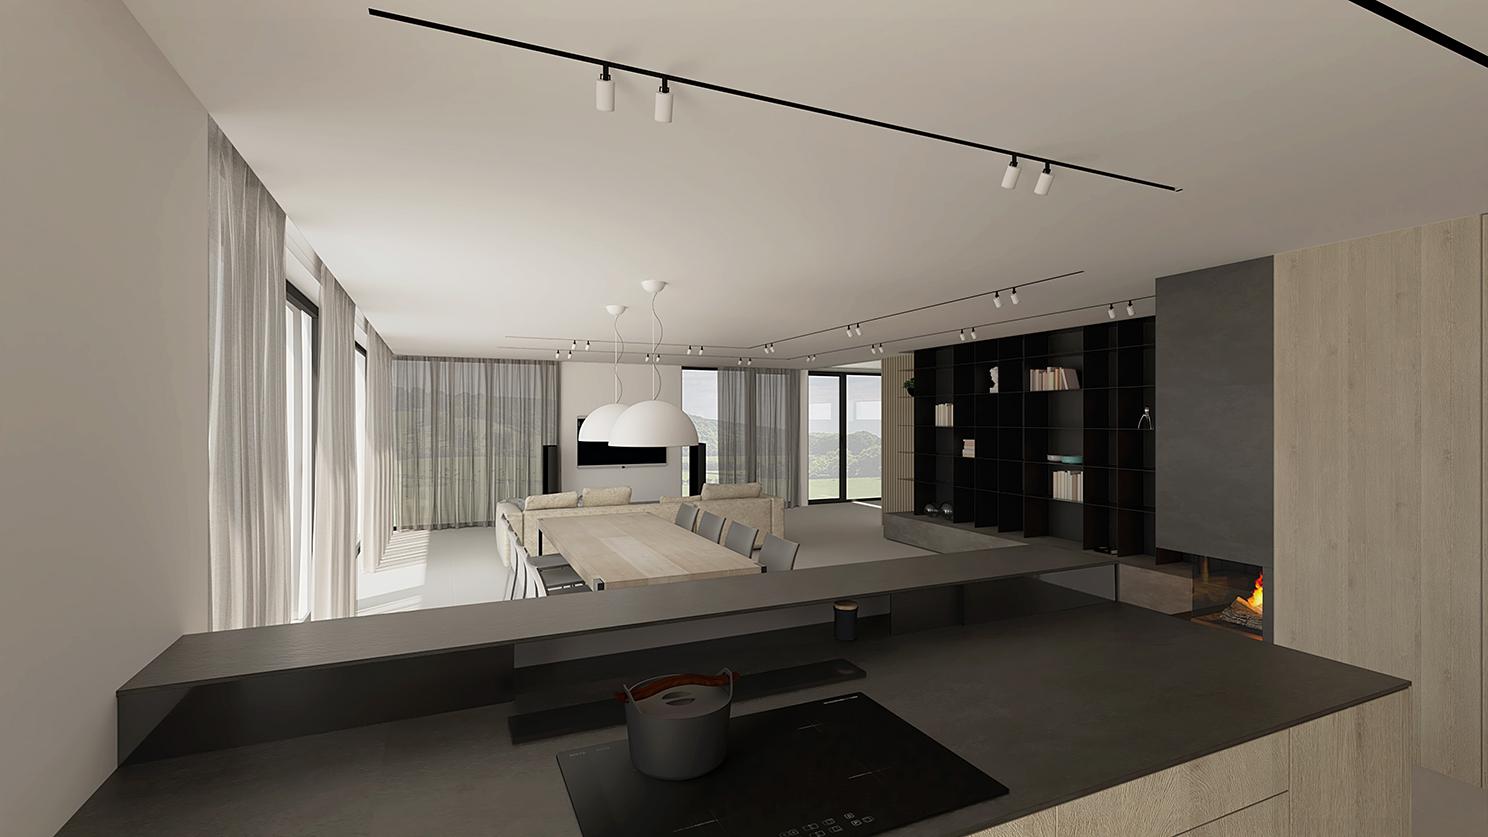 HRADISTE 04 Barbora Leblova Interiors Architecture